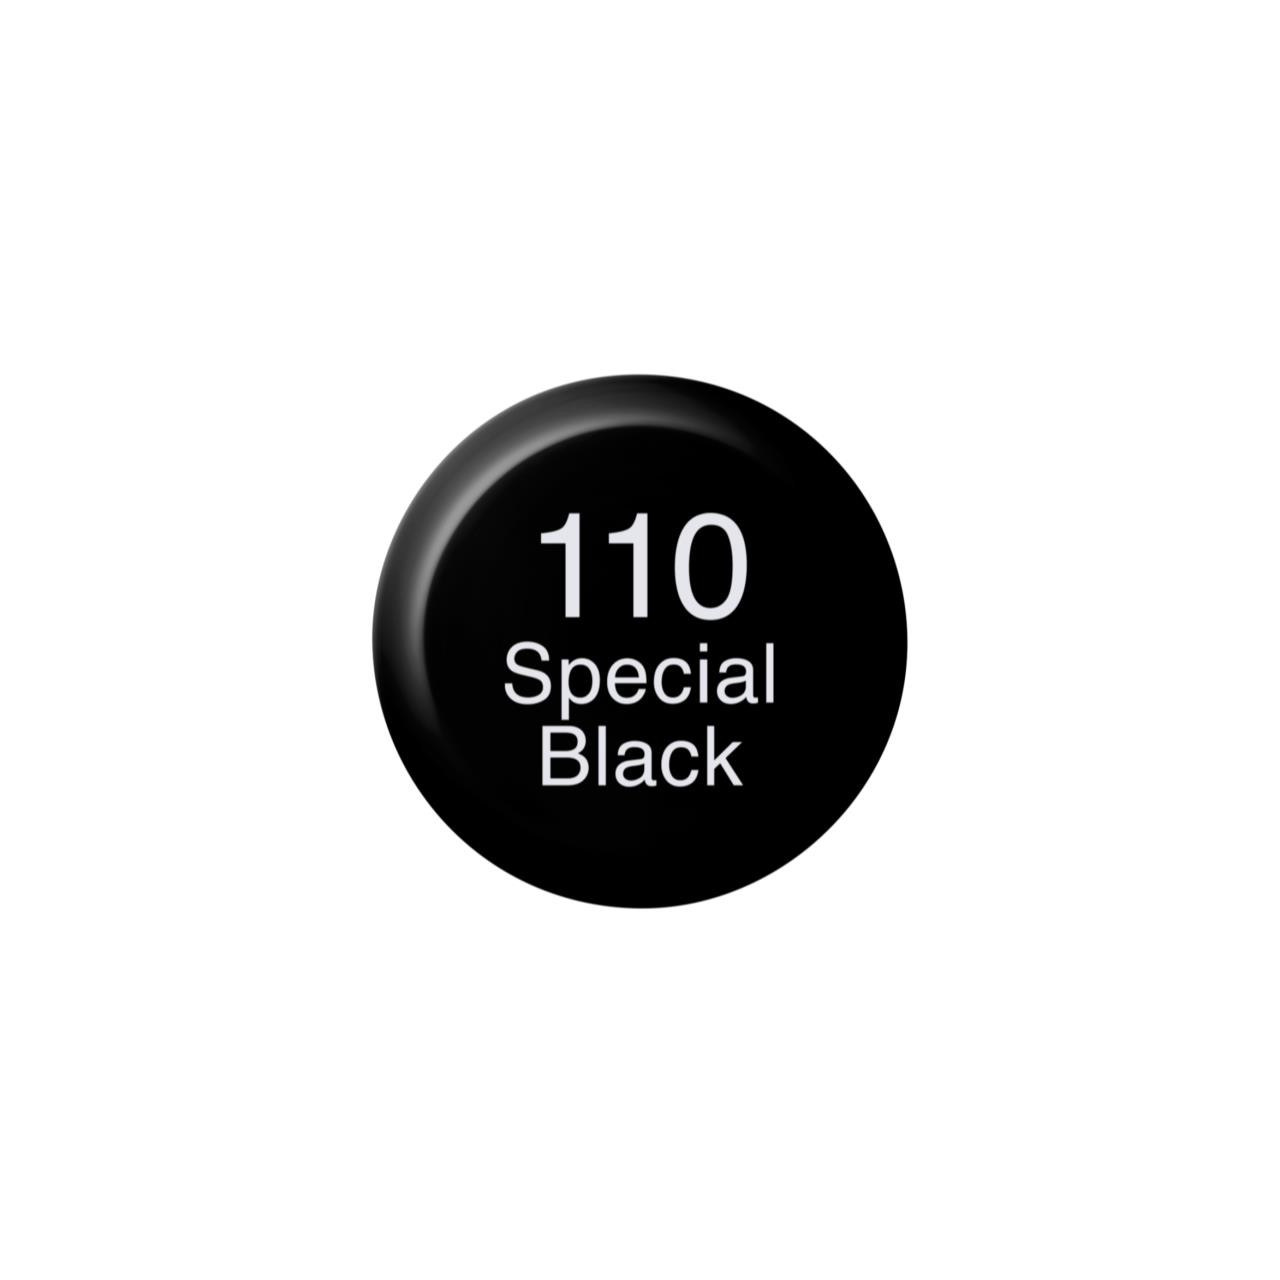 110 Special Black, Copic Ink - 4511338055793